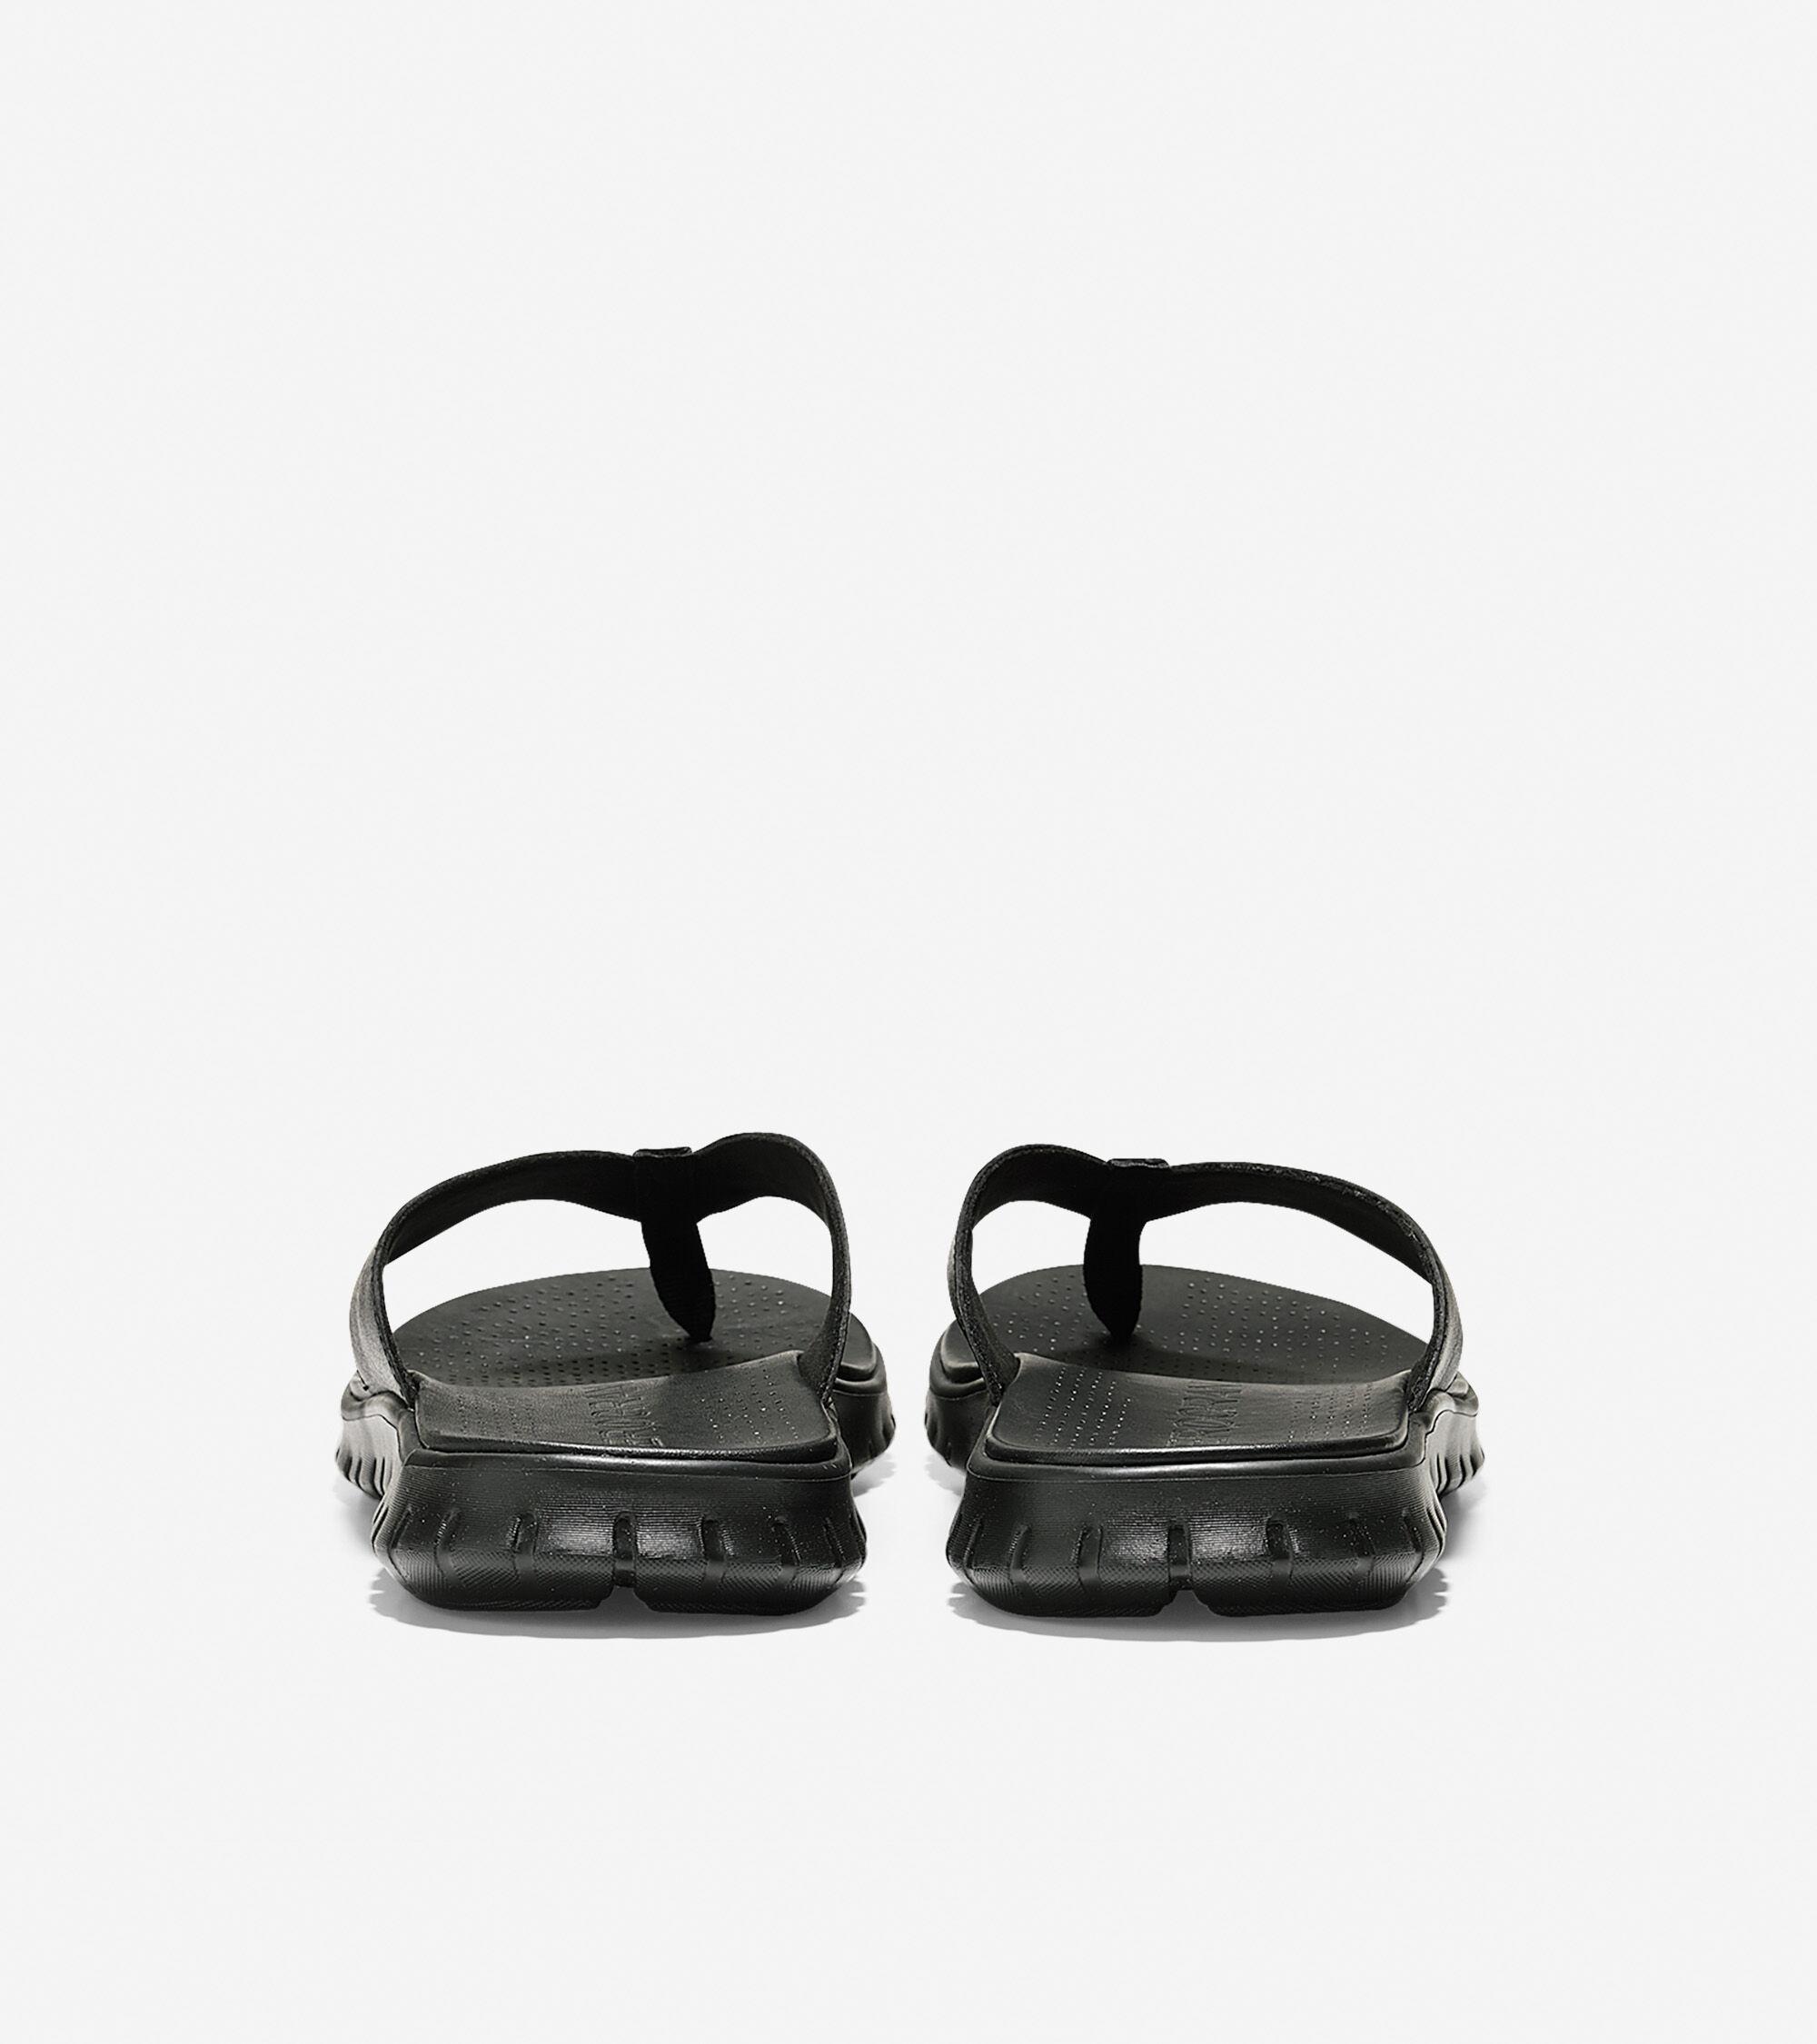 525e5caac10 Men s ZEROGRAND Thong Sandals in Black